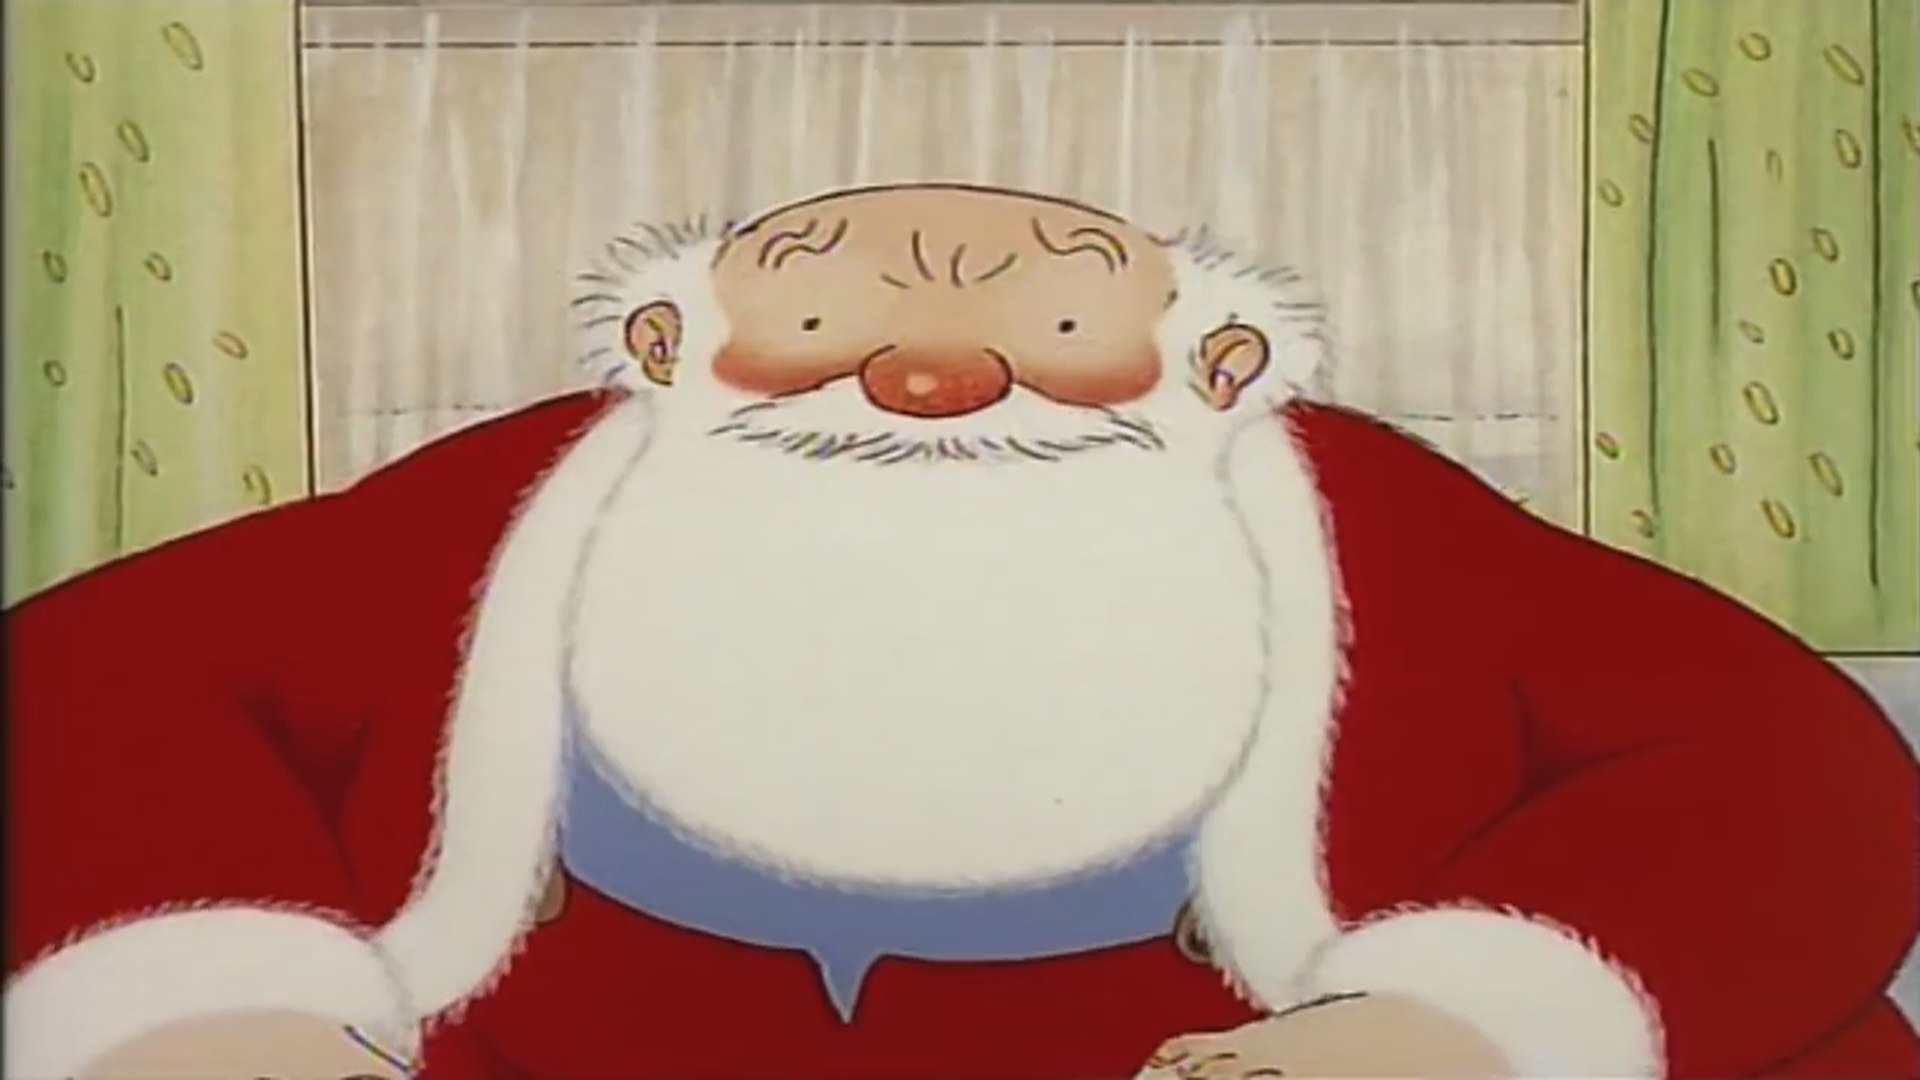 Father Christmas Cartoon Images.Christmas Cartoon Father Christmas 1991 Exclusive Version